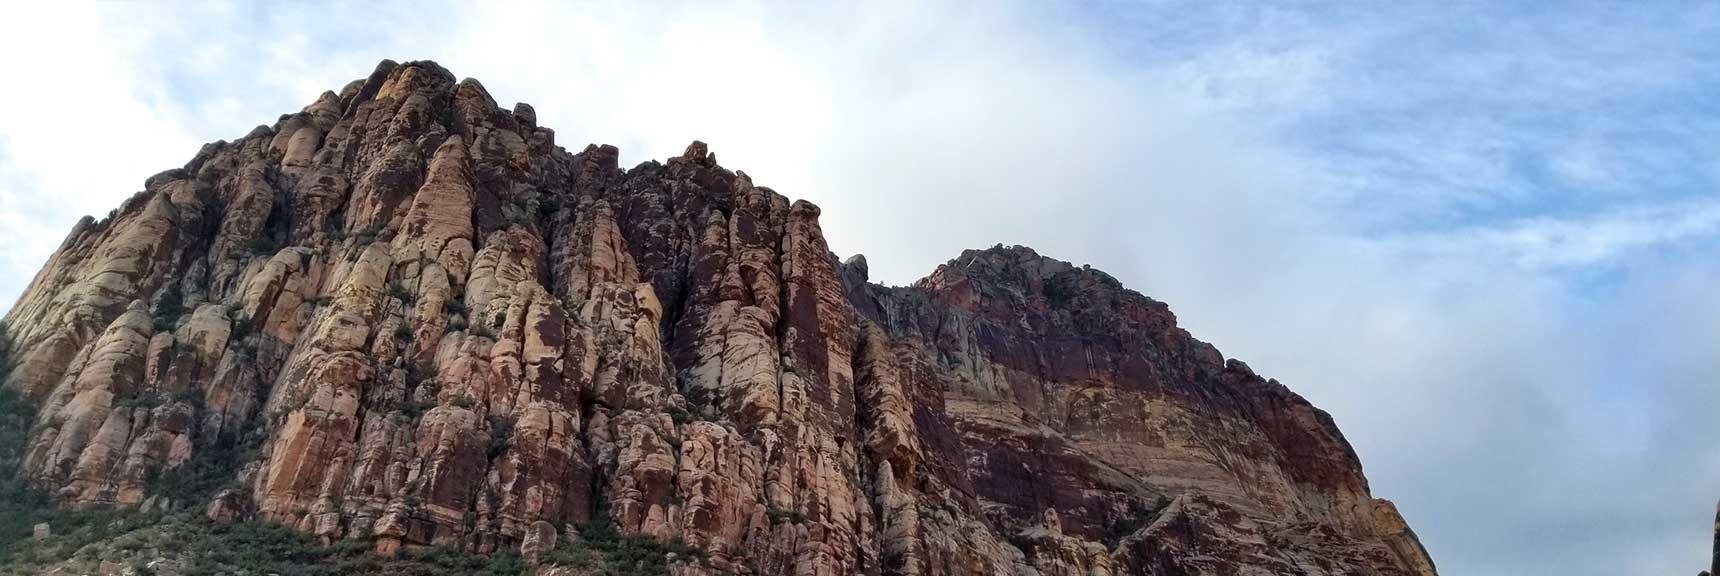 Juniper Peak from Pine Creek Canyon, Red Rock National Park, Nevada